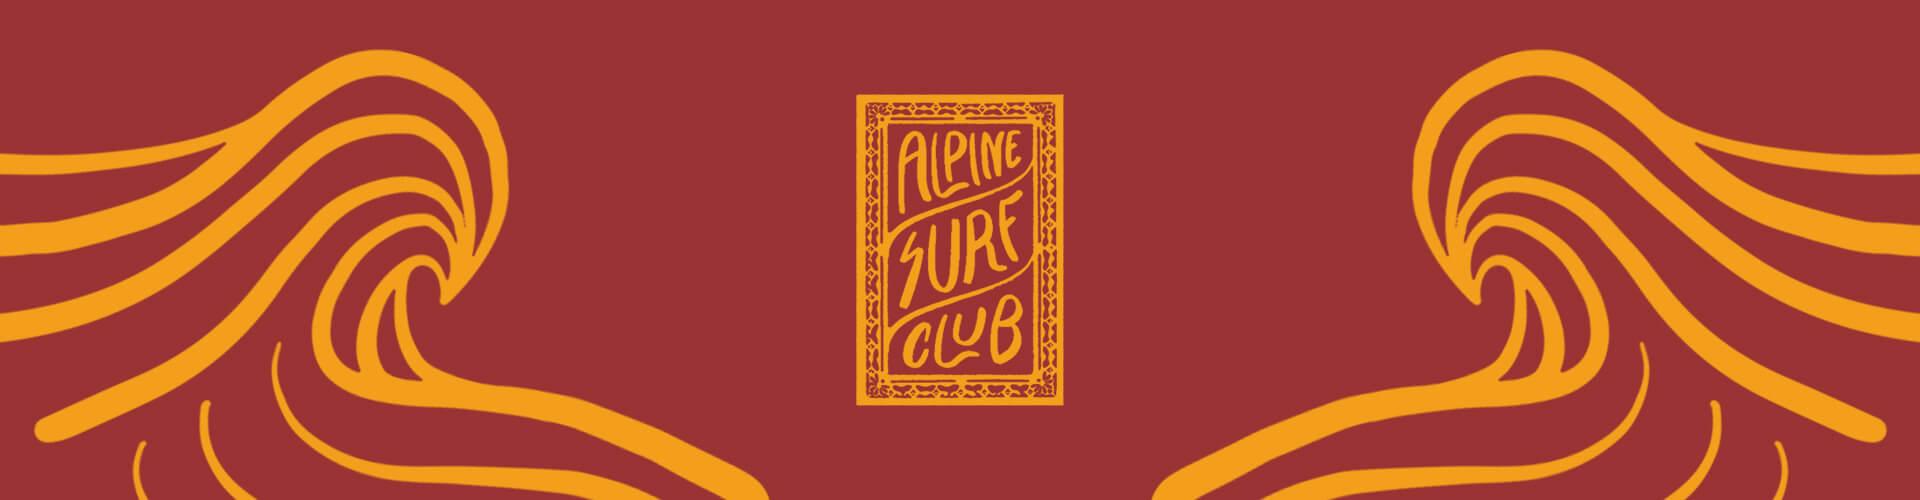 Alaïa Bay - Alpine Surf Club